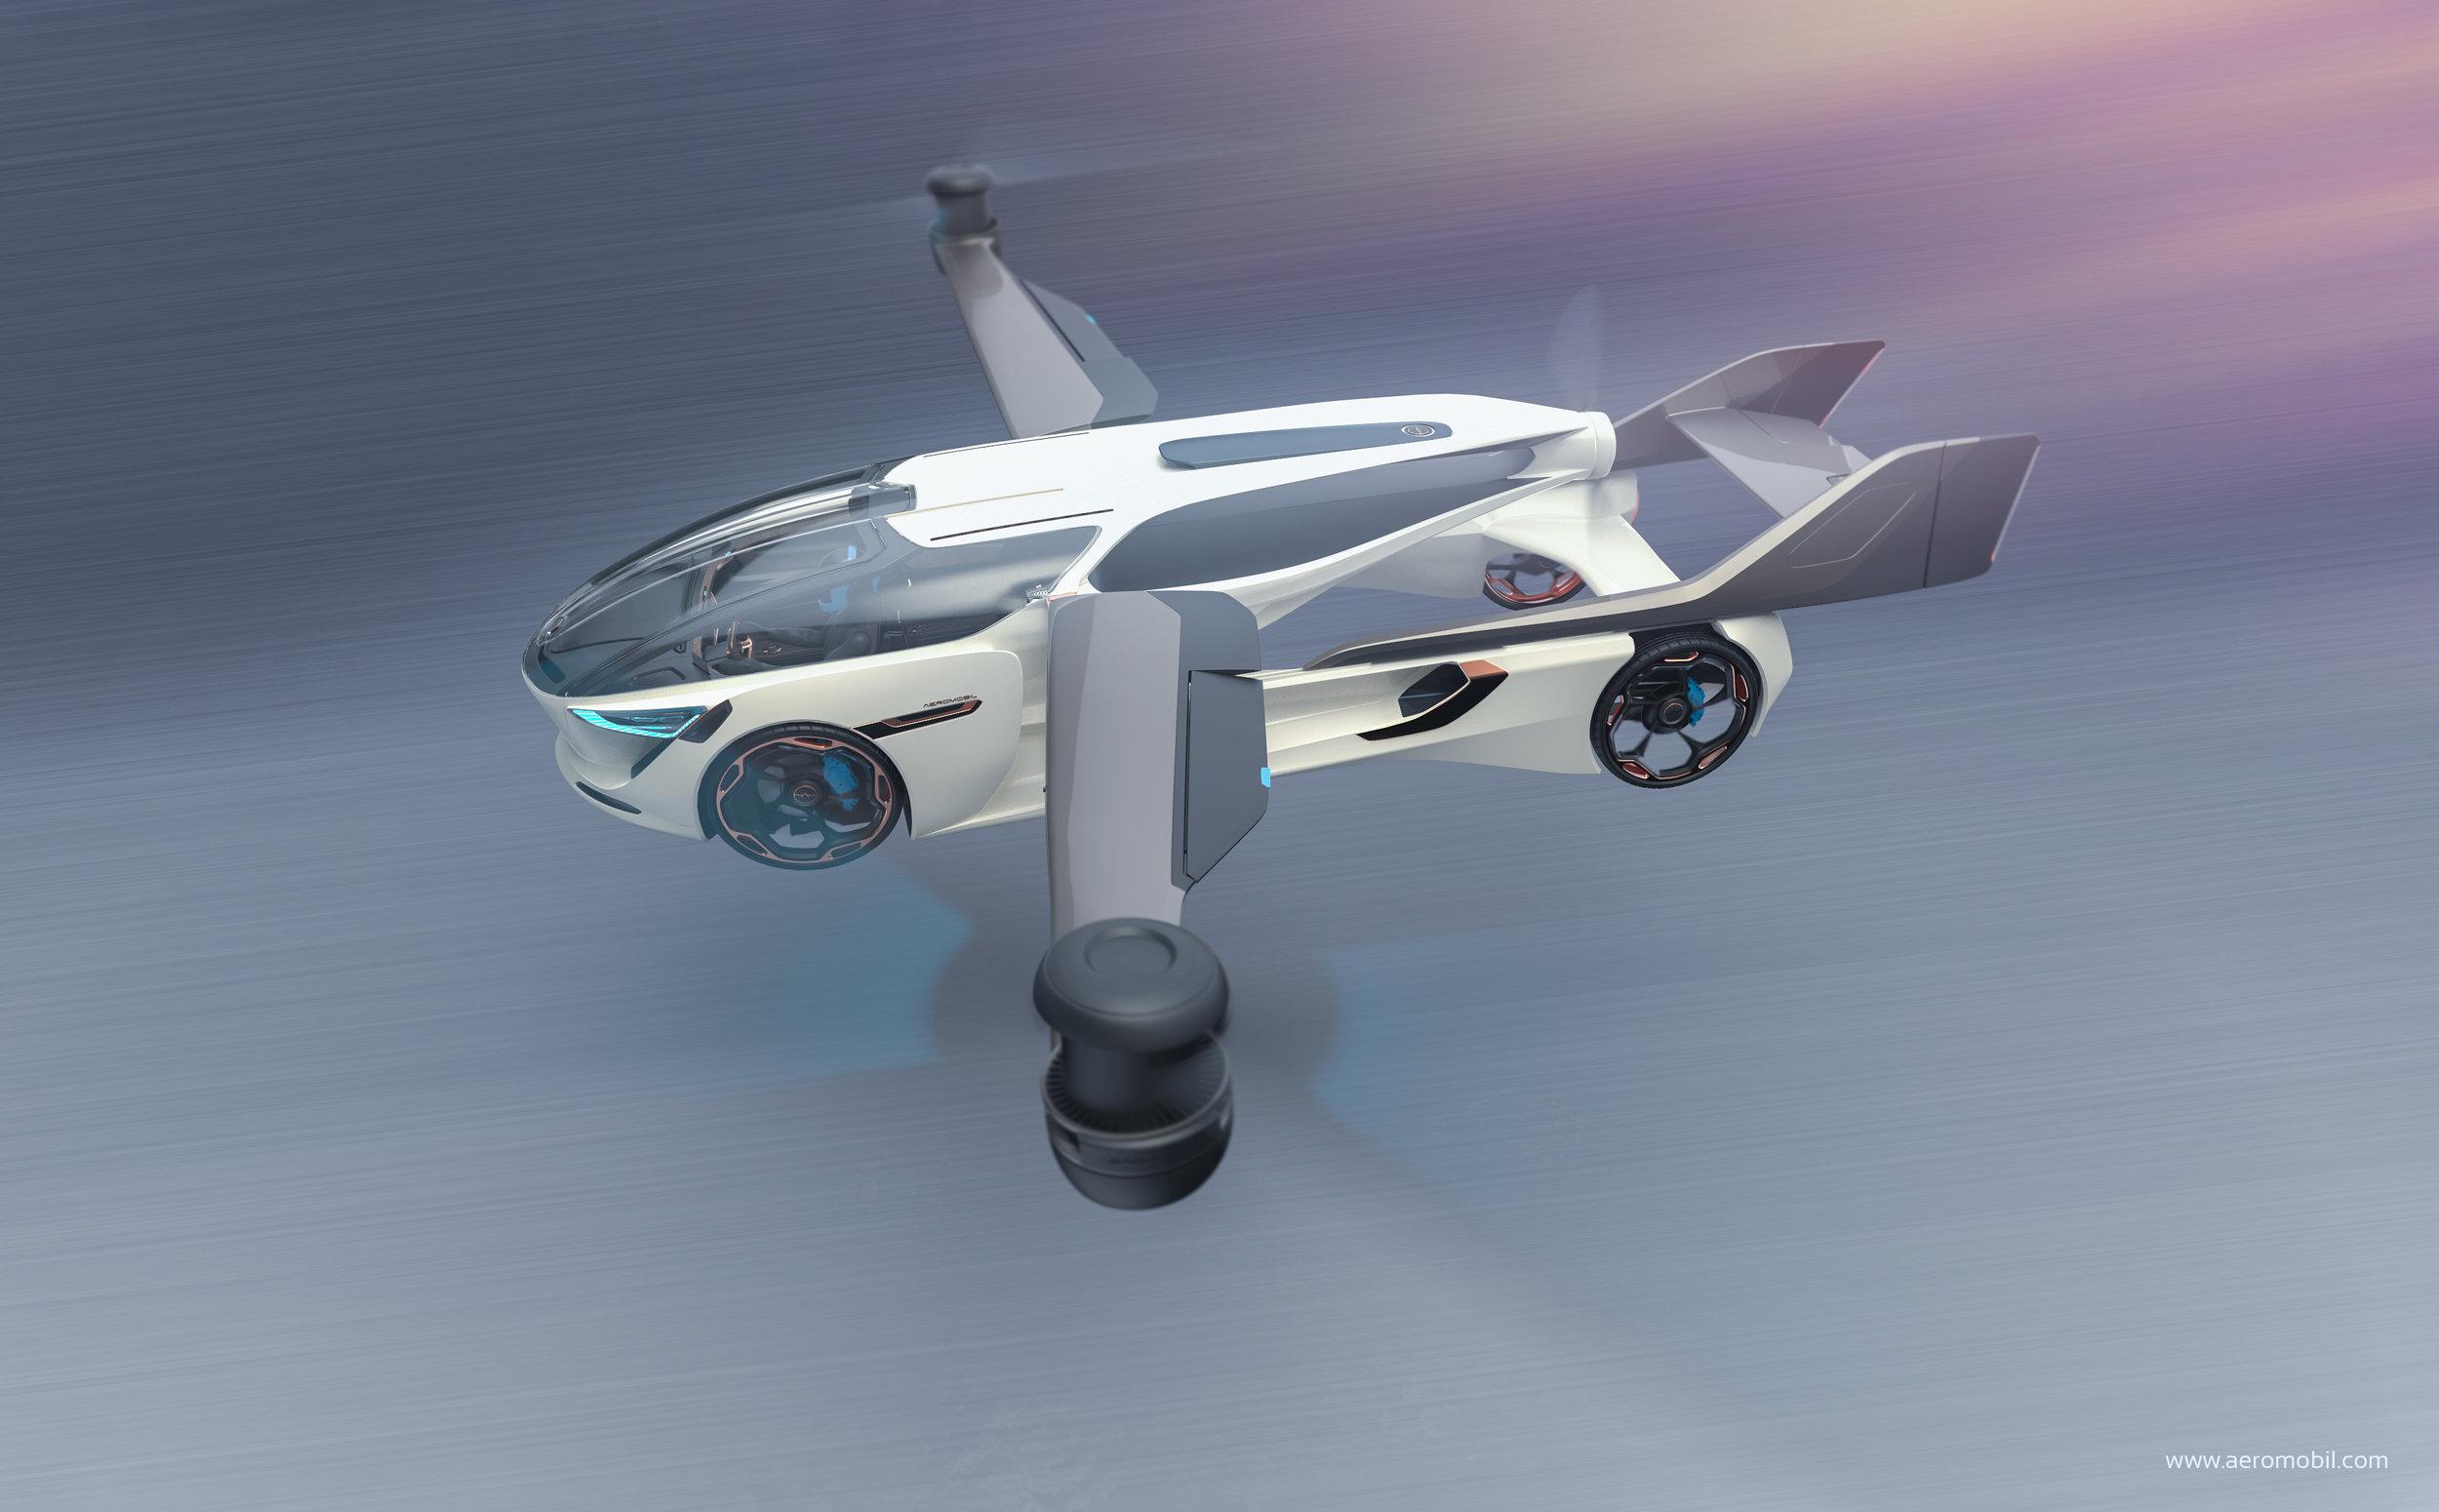 AeroMobil_5.0_VTOL_CONCEPT_drone_configuration_from_above.jpg